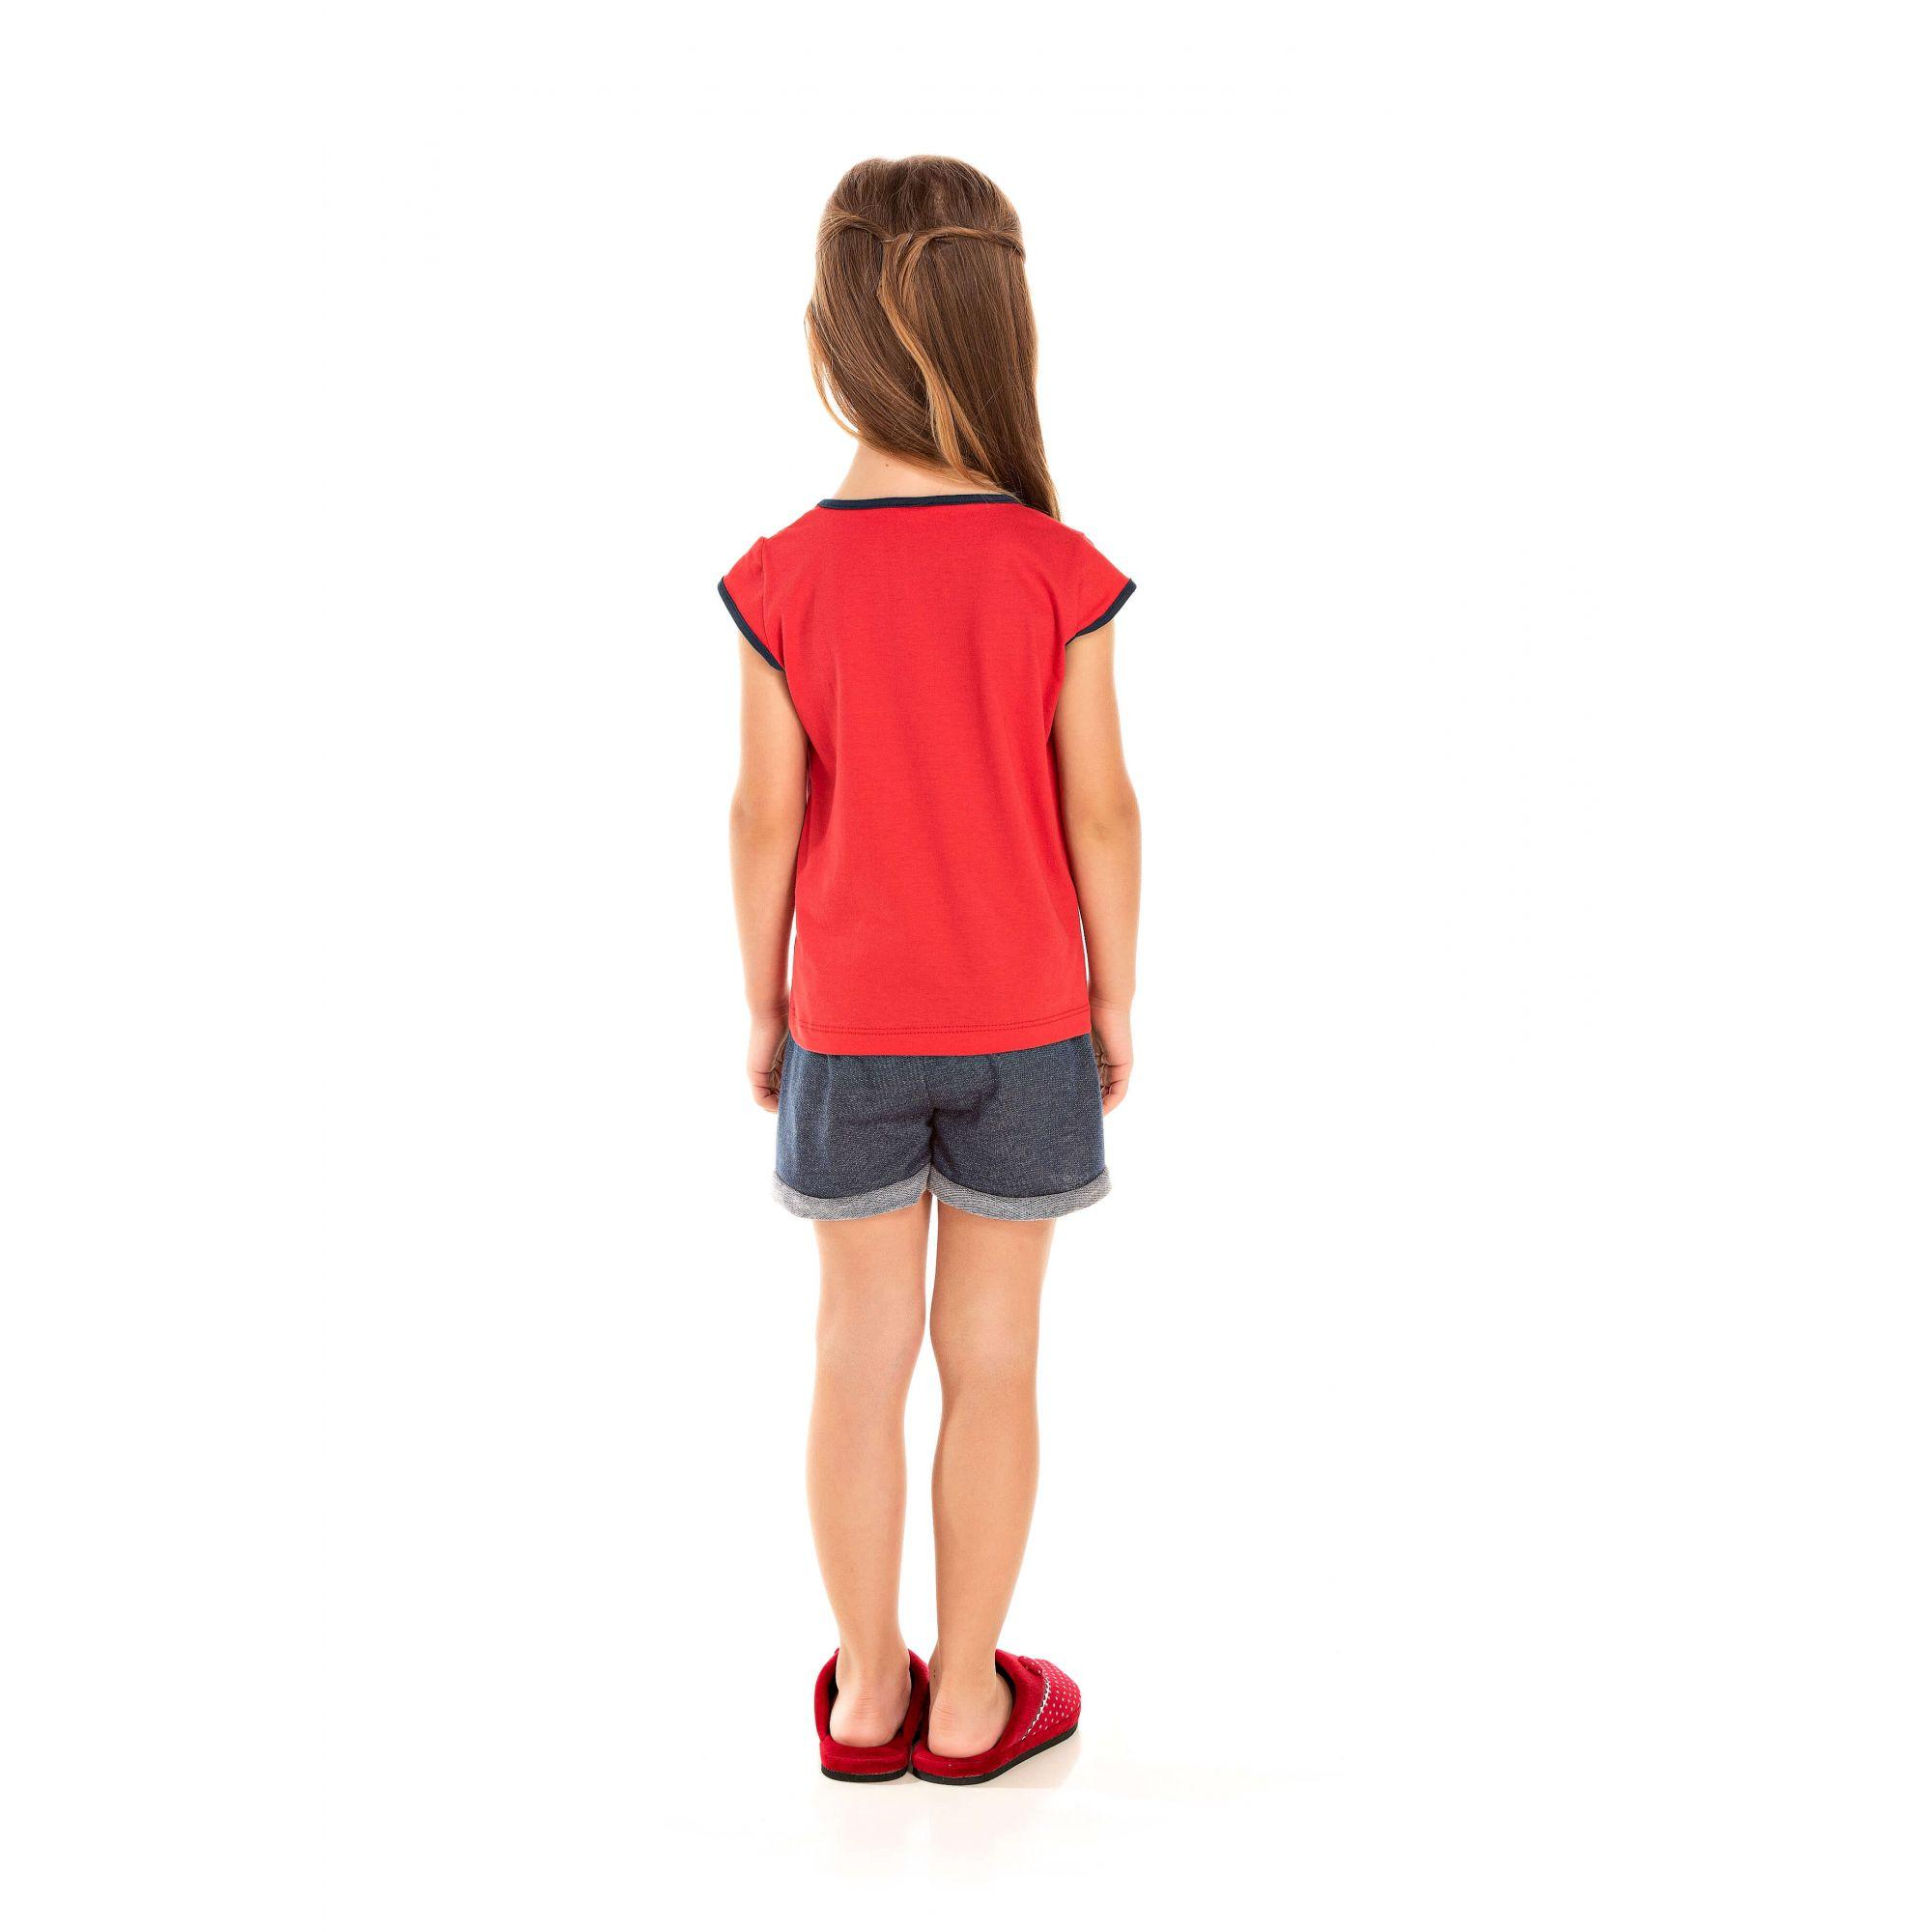 009 - Short Doll Infantil Feminino Love - Vermelho